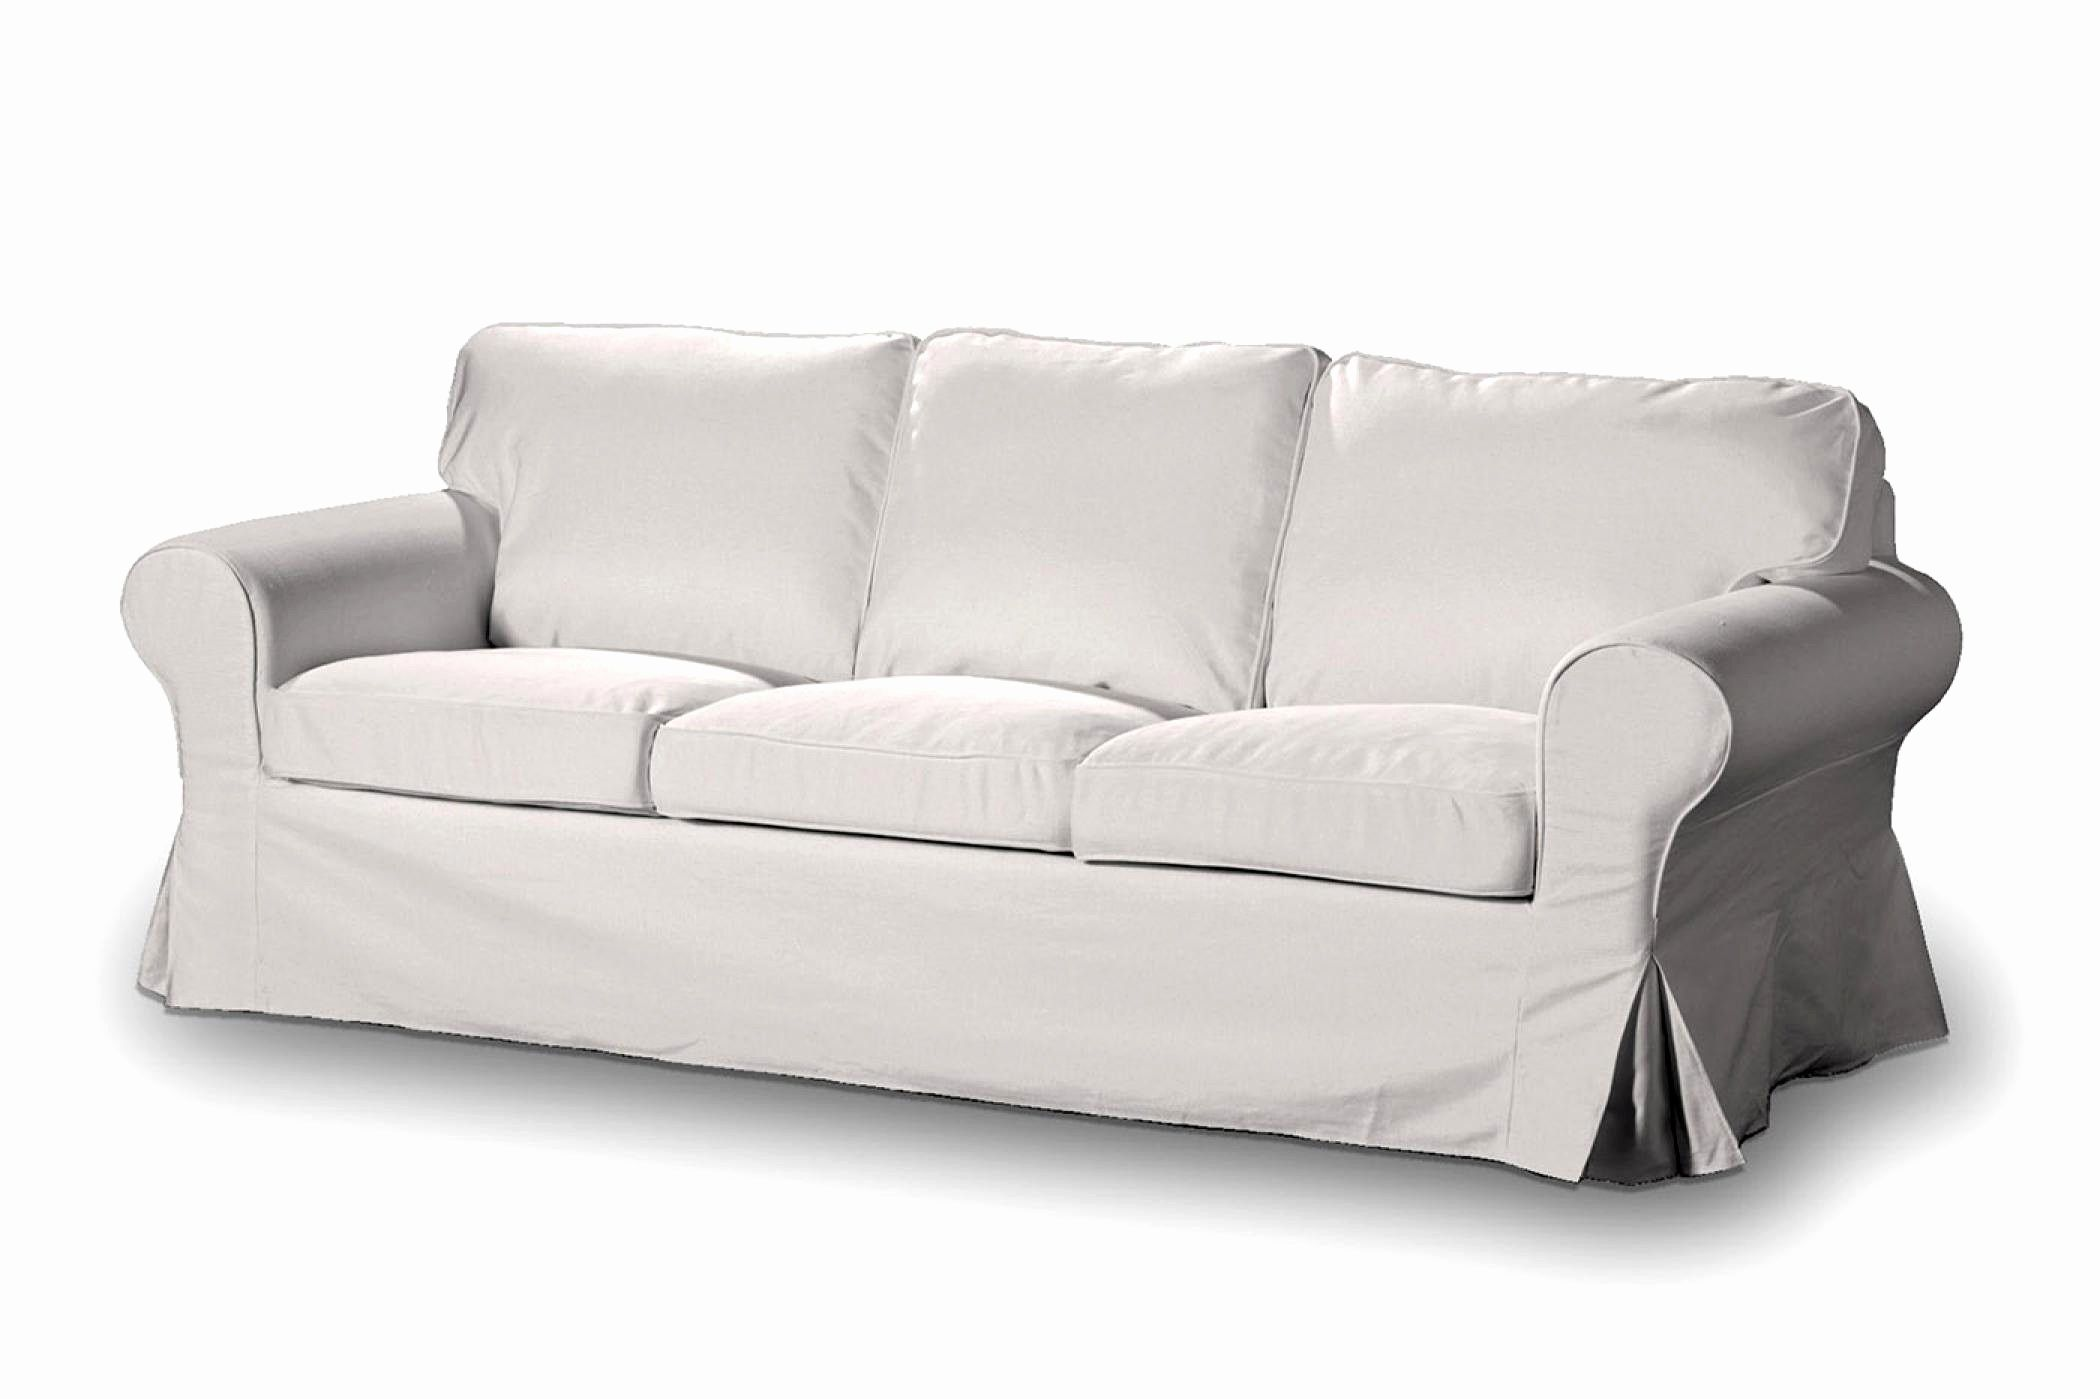 Lovely Housse Kivik Convertible Ikea Bed Sofa Cama Chair Bed Ikea